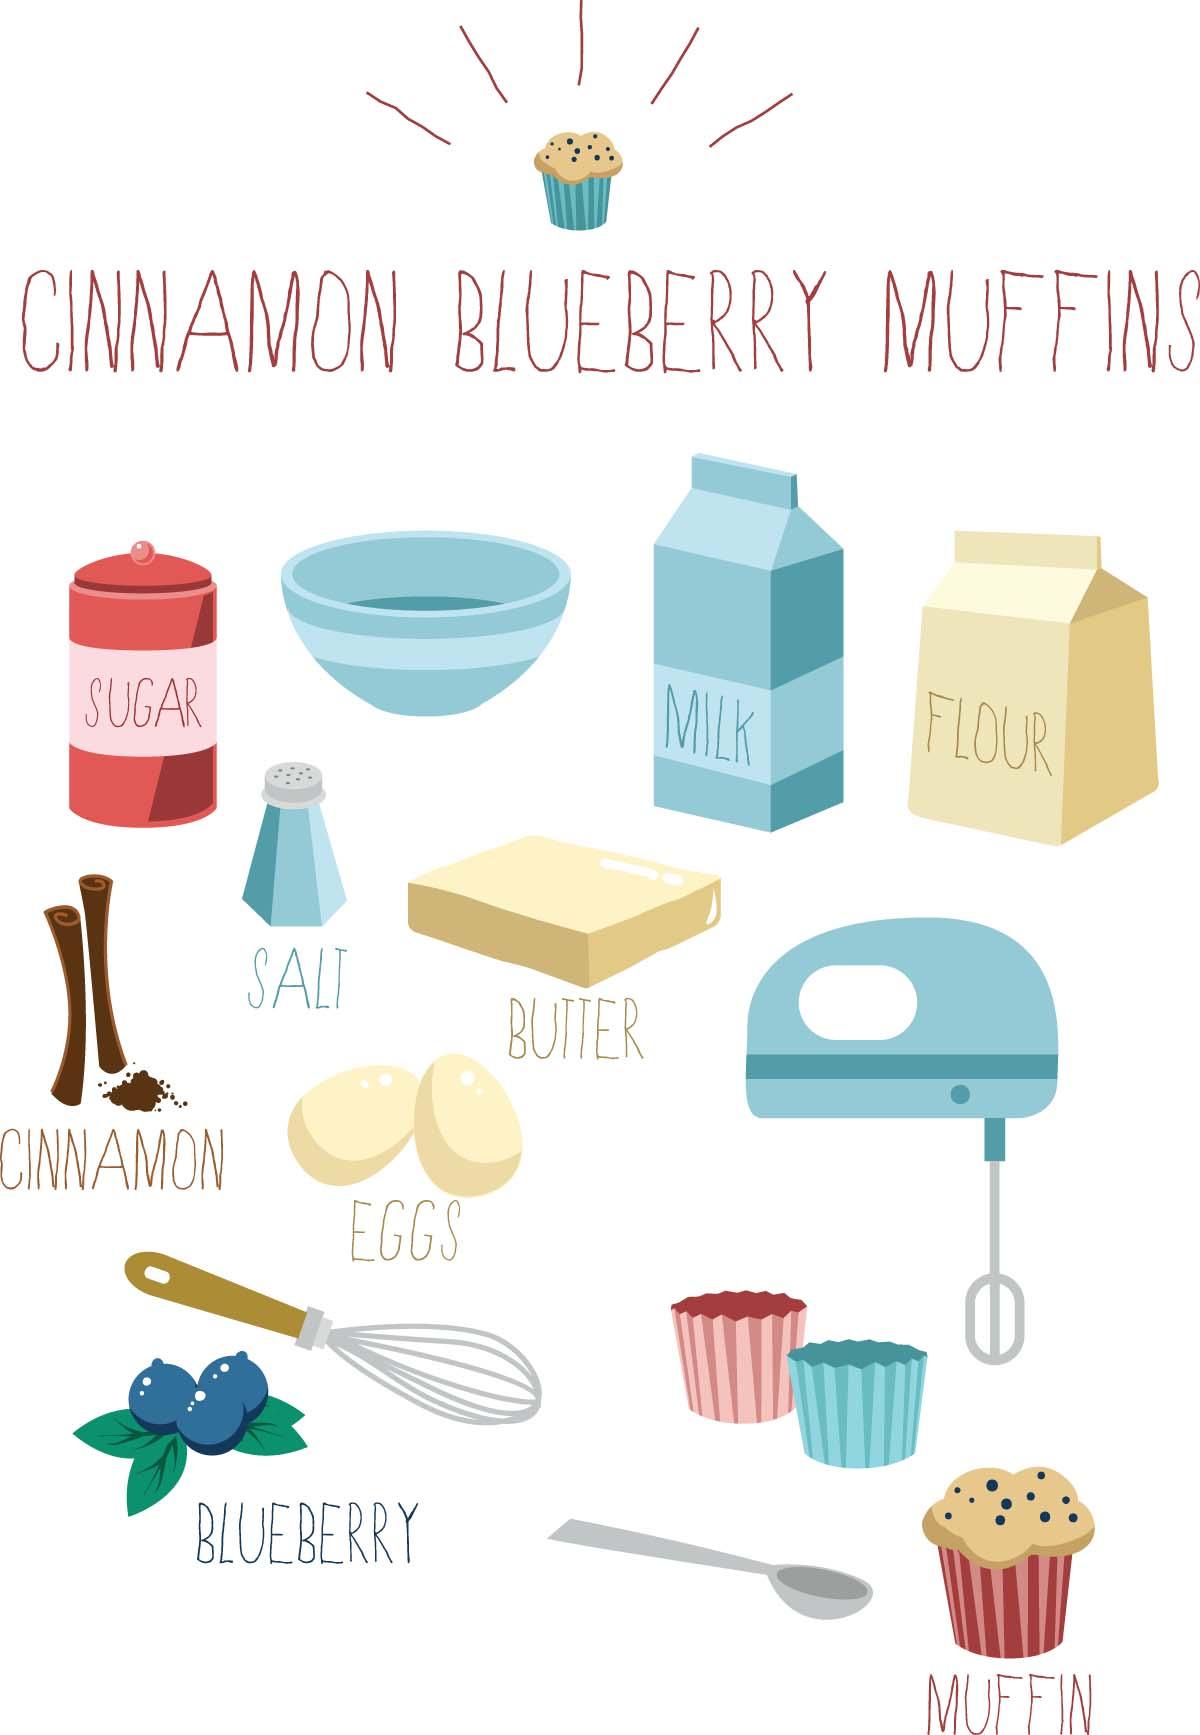 Blueberry muffin recipe modern vector